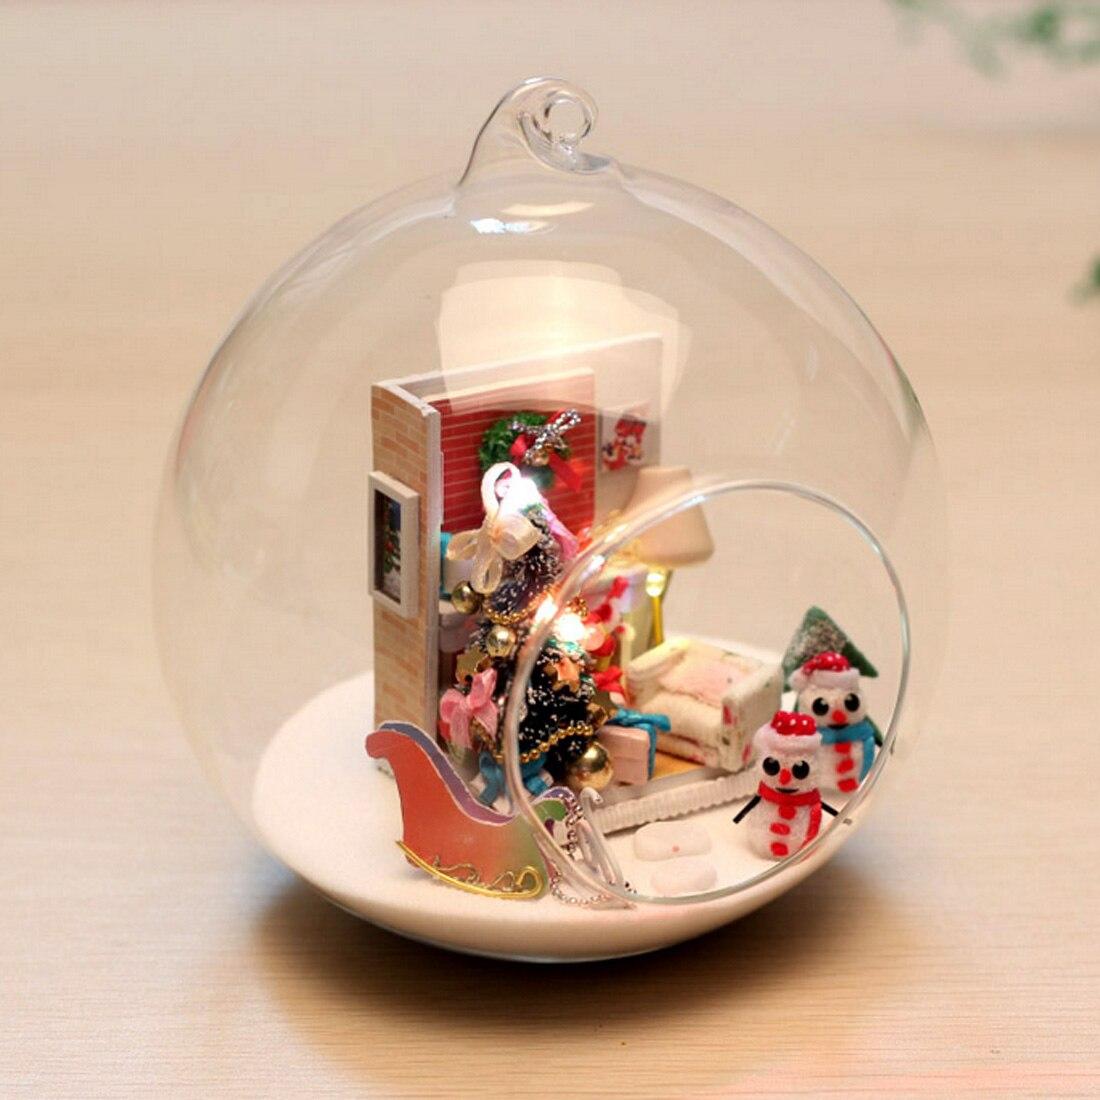 ZOOYOO DIY Wooden Dollhouse Miniature